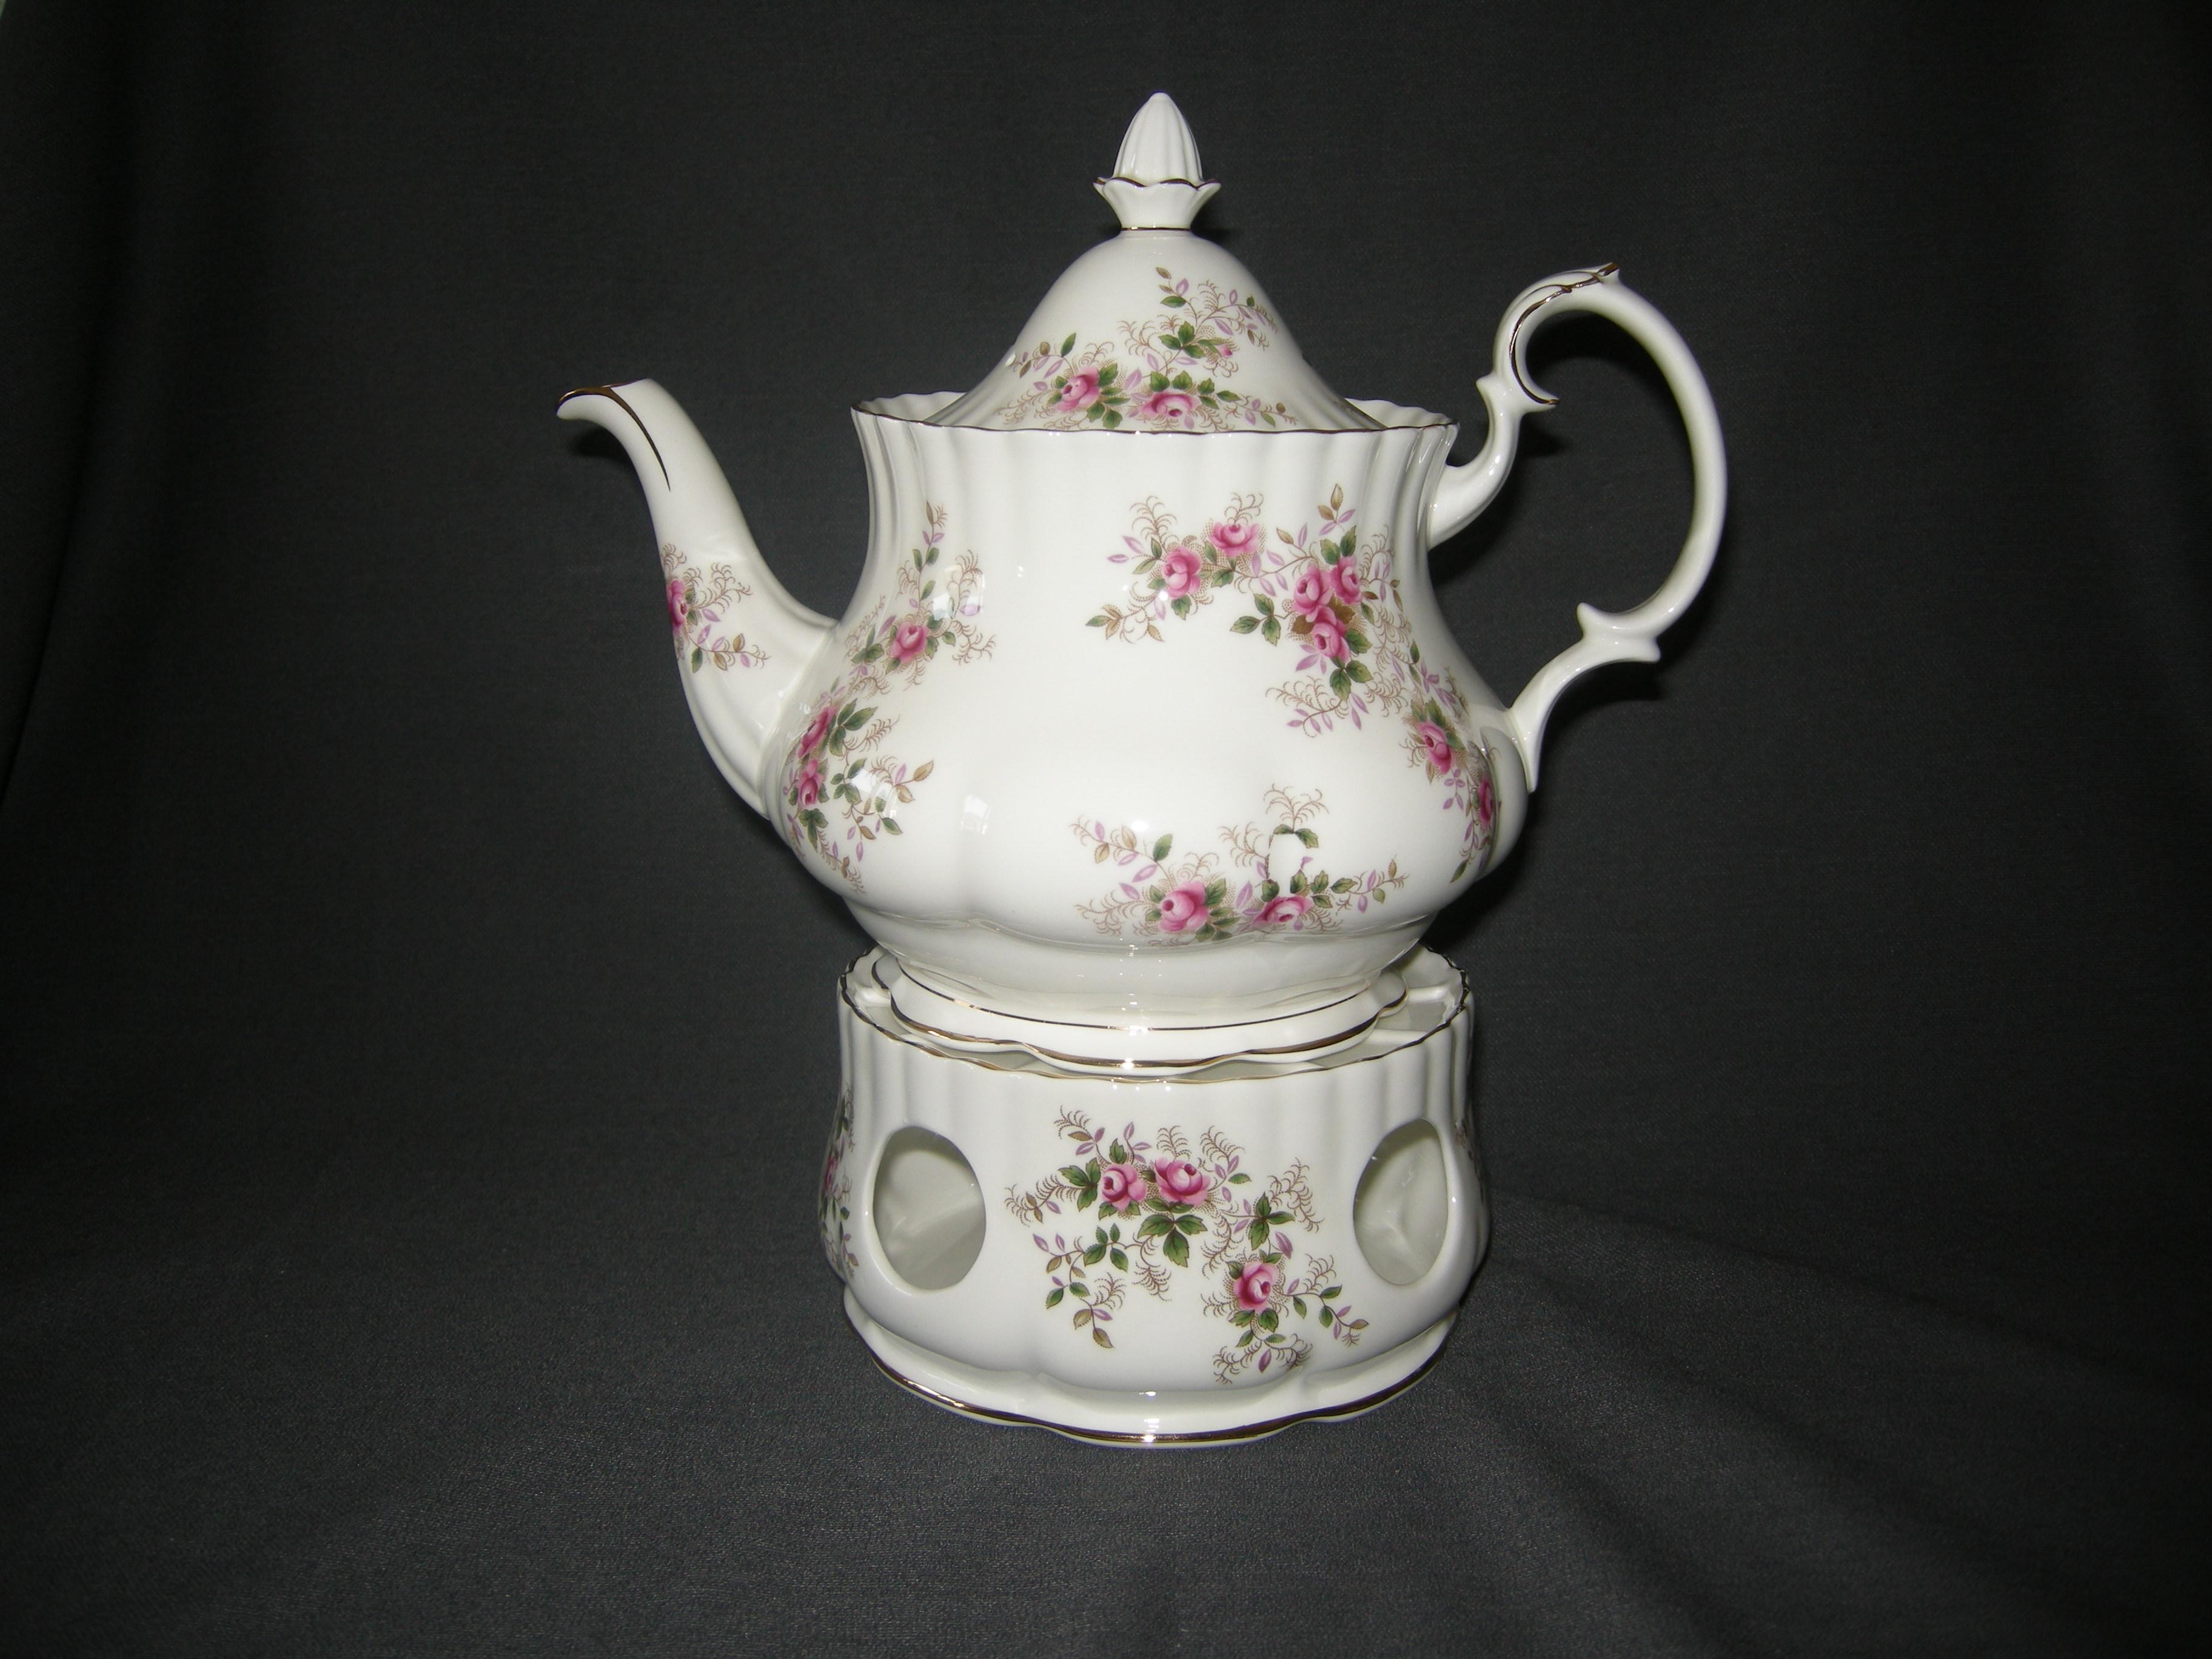 Royal Albert Servies Lavender Rose.Servies Lavender Rose Servies